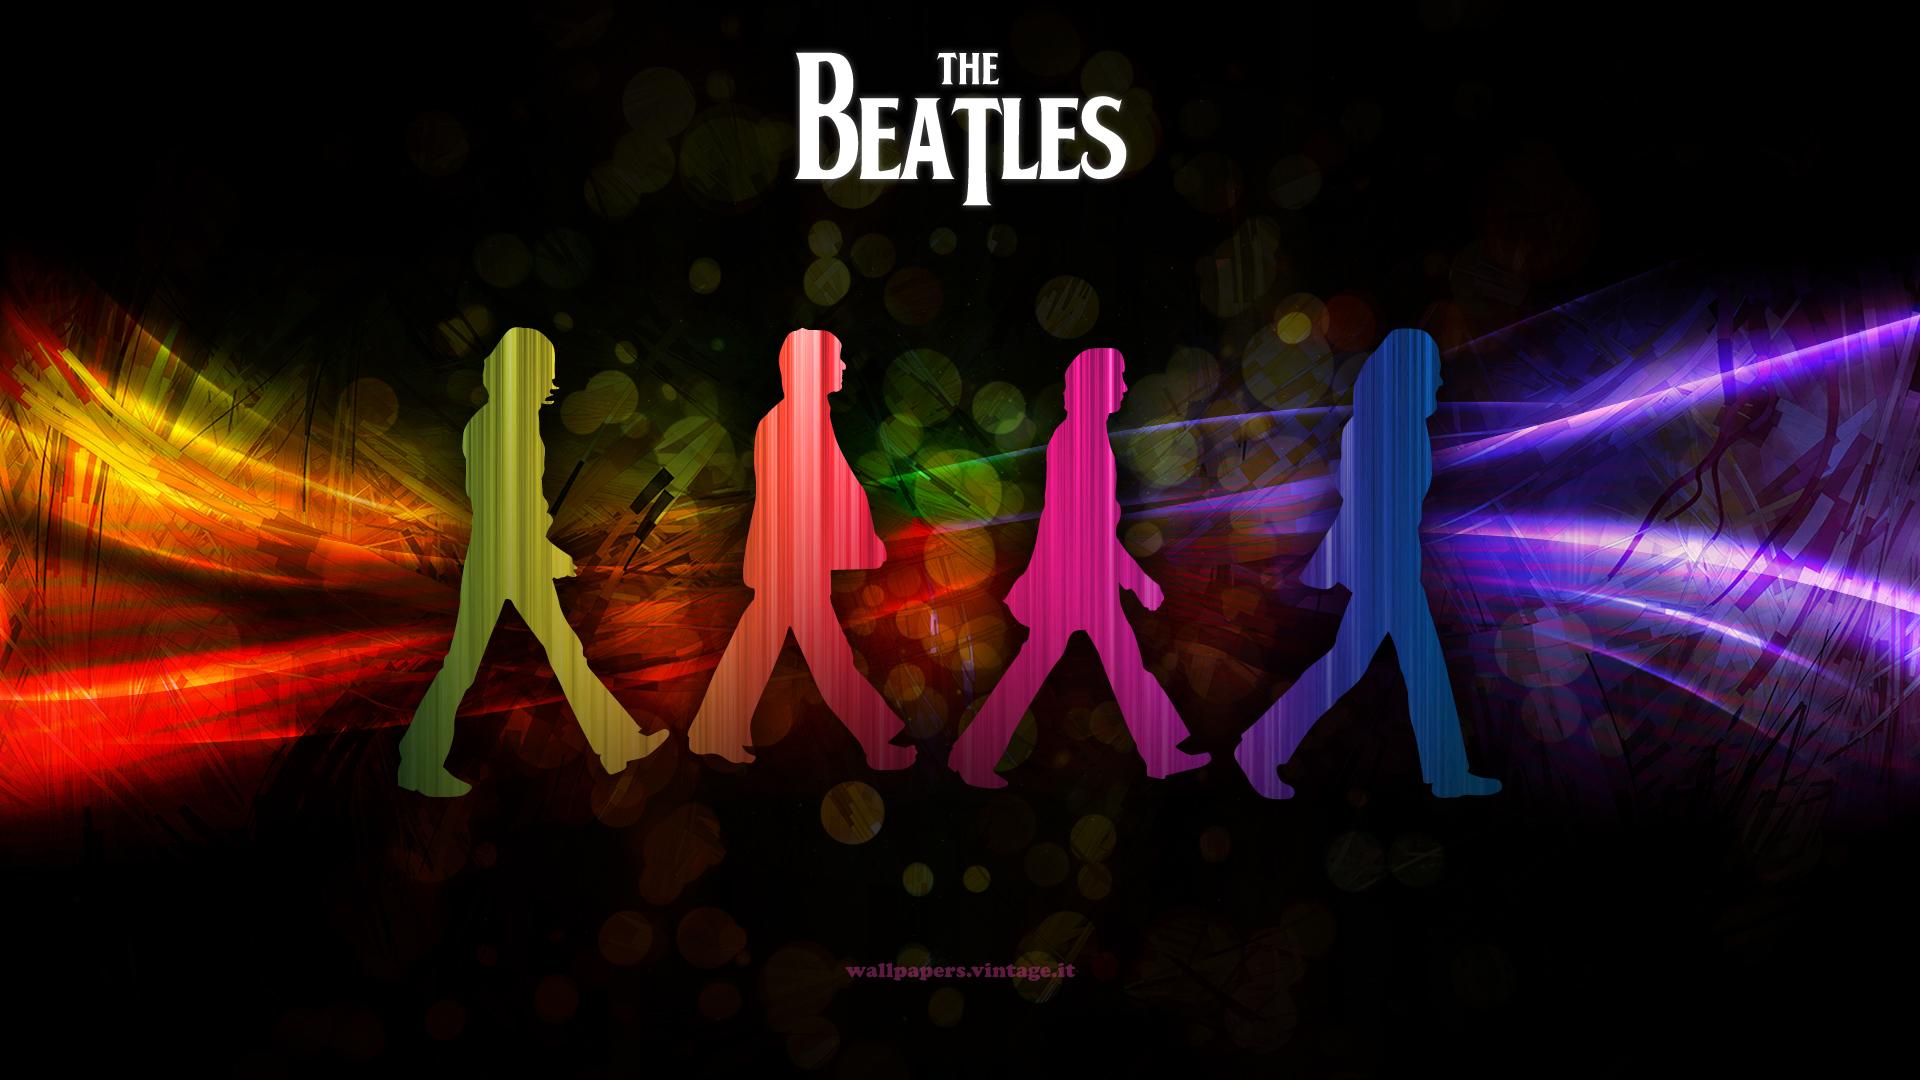 Simple Wallpaper Mac The Beatles - the_Beatles_wallpaper_1920x1080  Gallery_695846.jpg